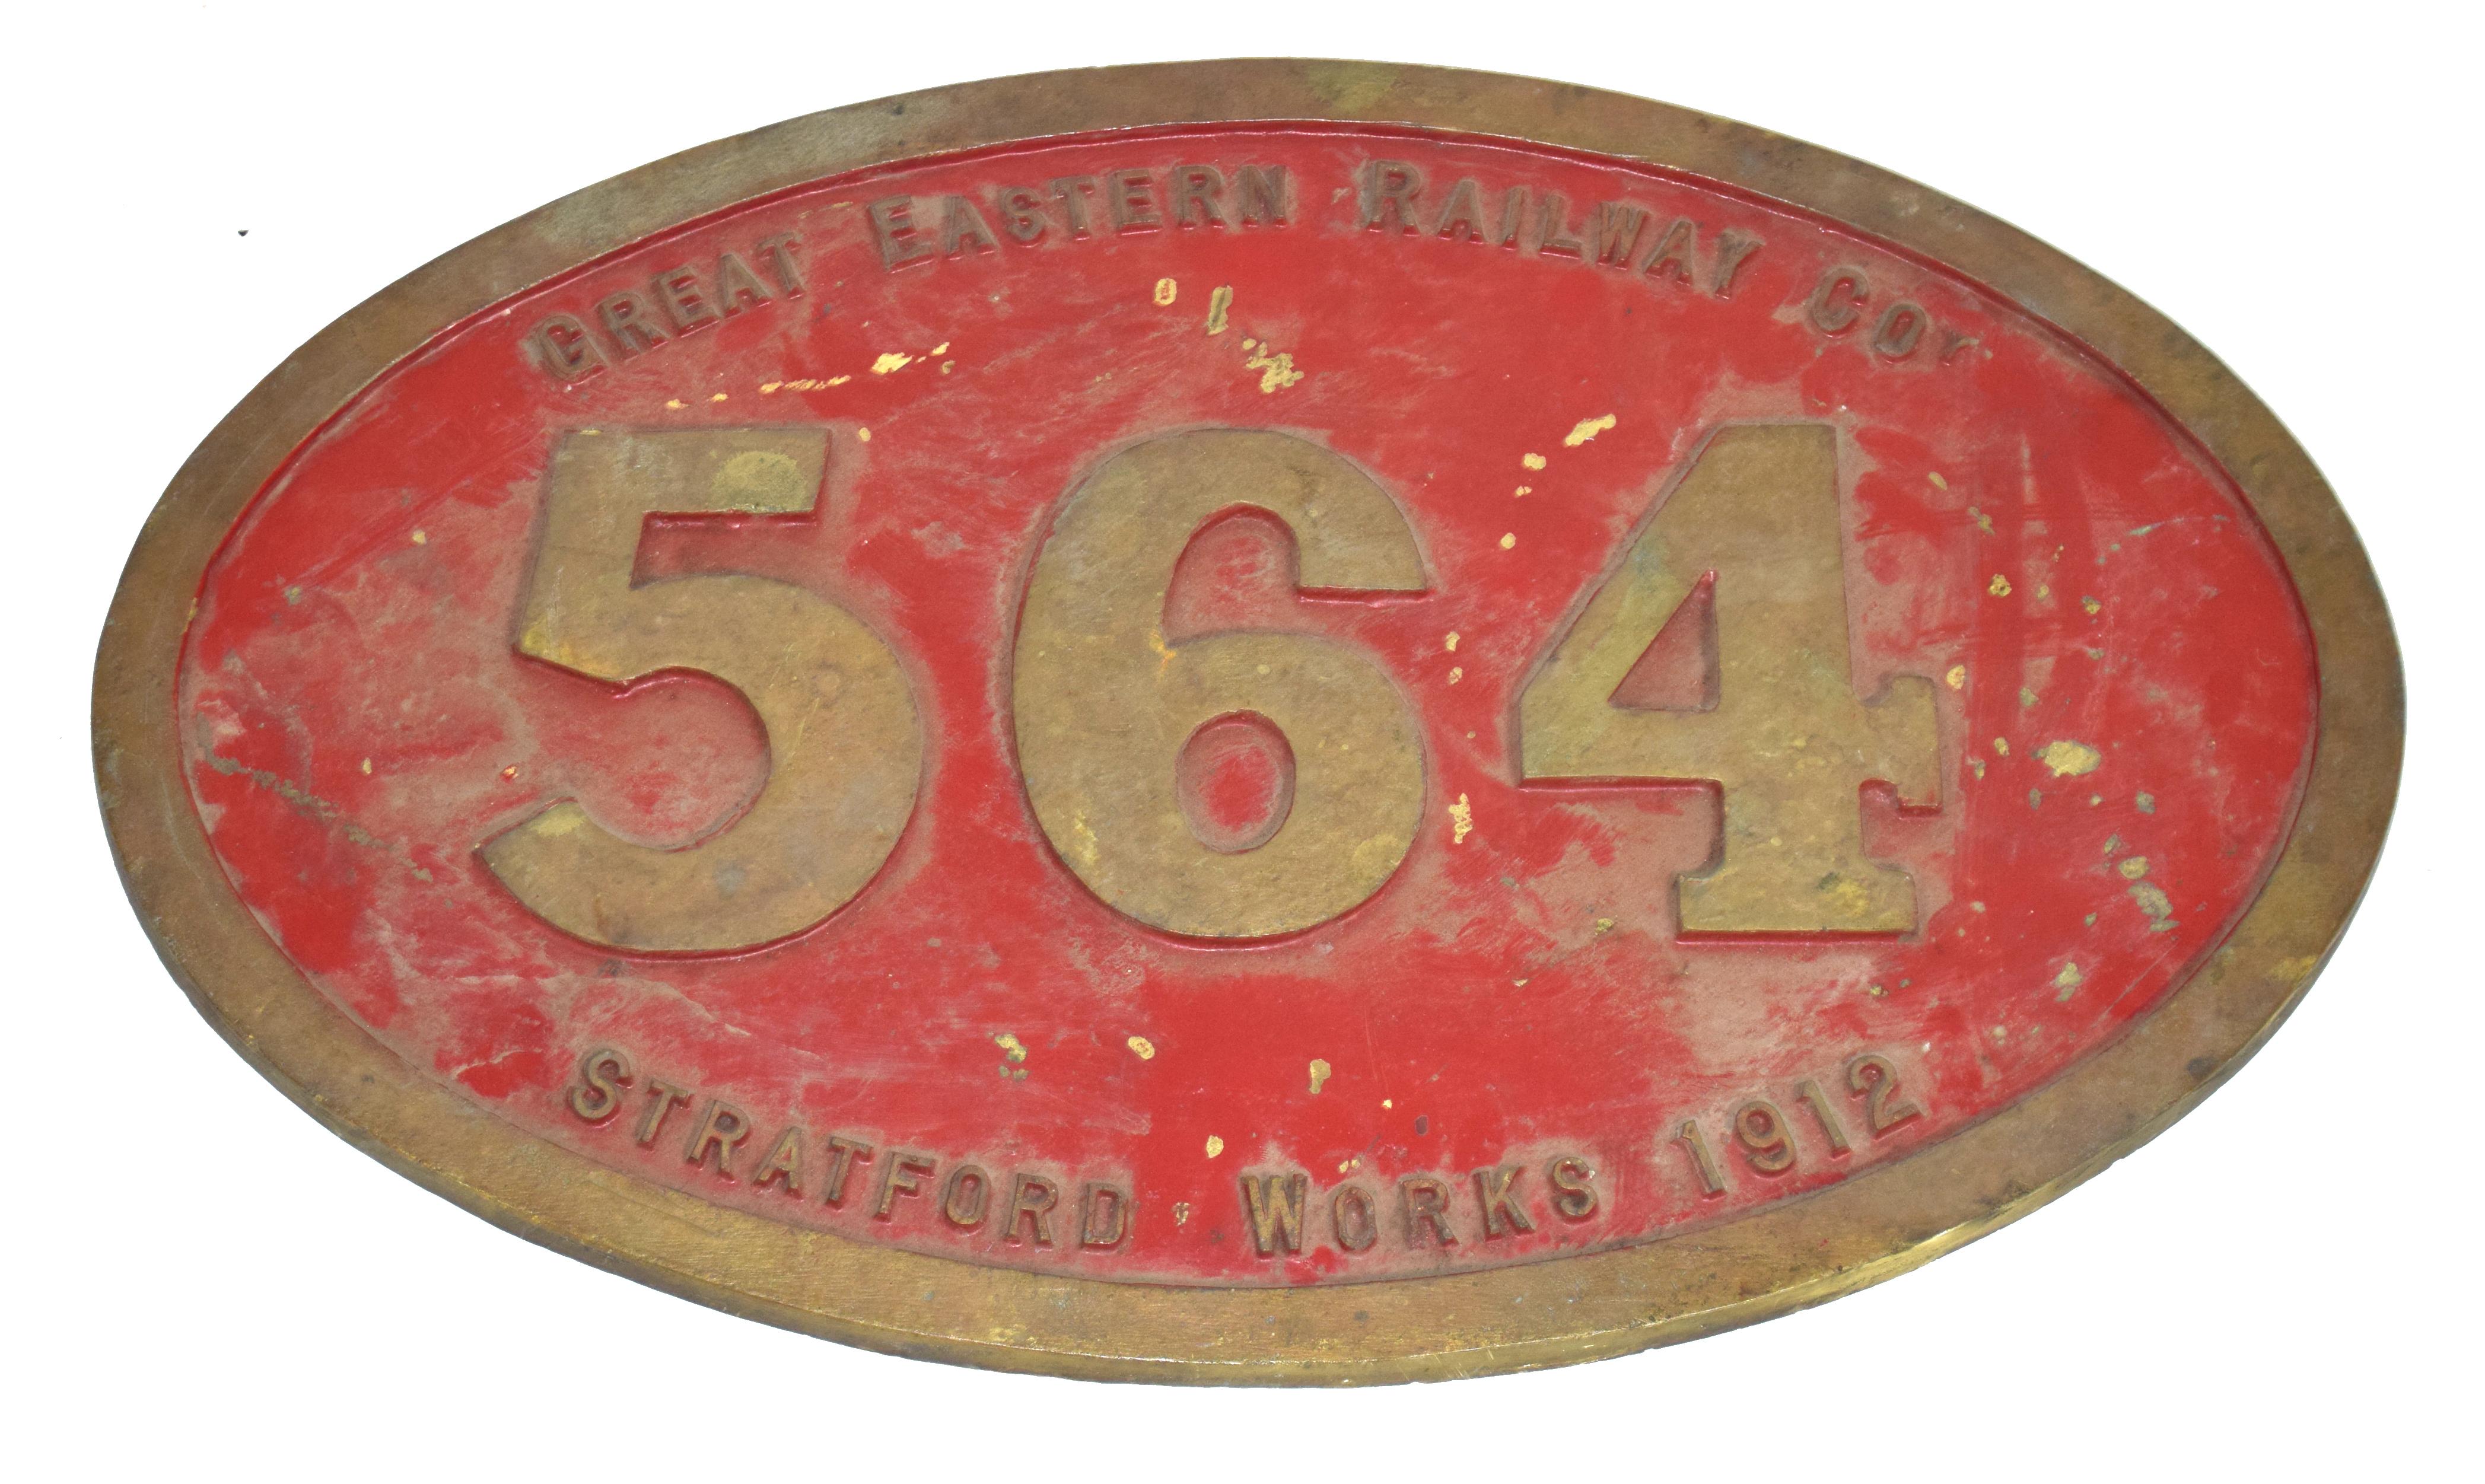 Railway interest engine plaque for Great Eastern Railway Co, Stratford Works 1912, No 564 bronze